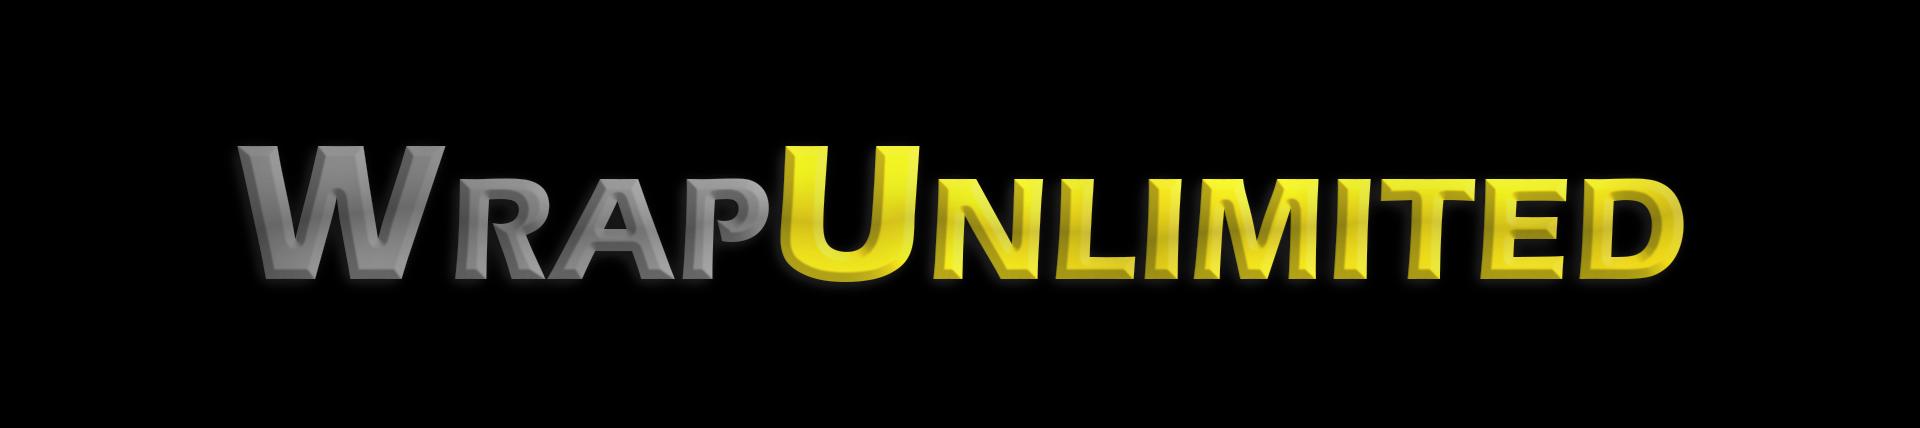 Wrap Unlimited - Parkstad Limburg